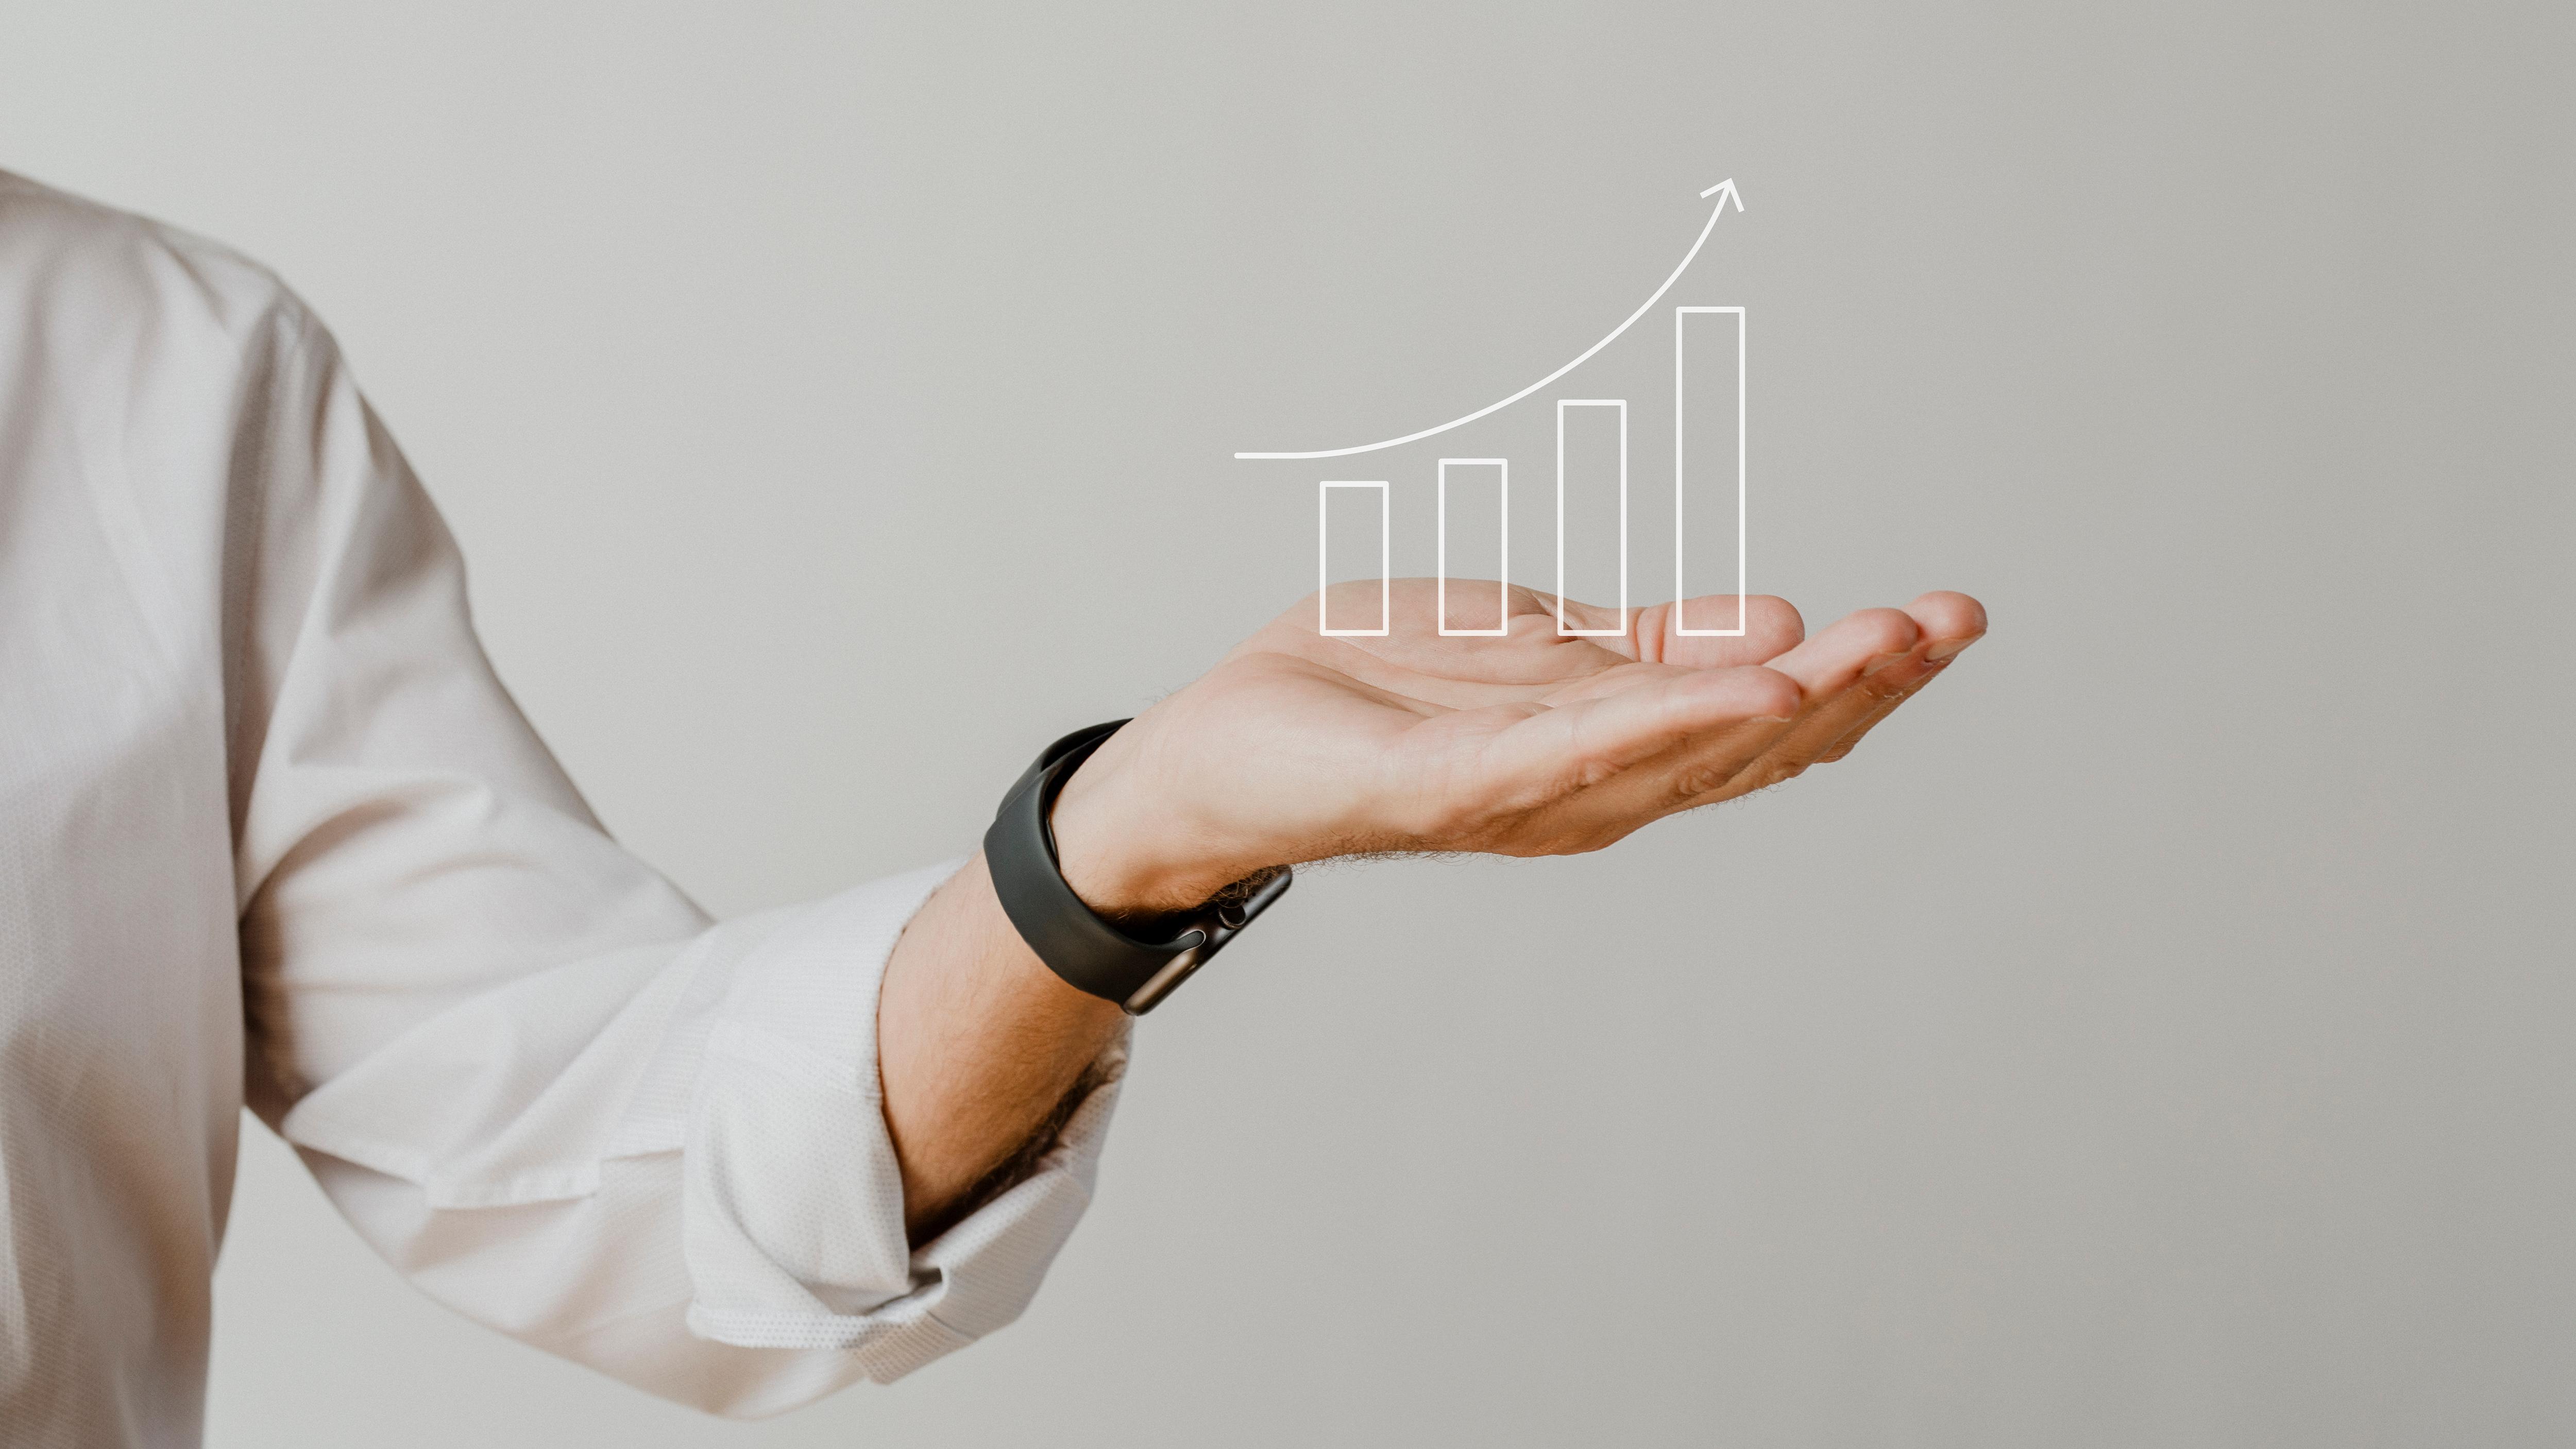 Digital increasing bar graph with businessman hand overlay